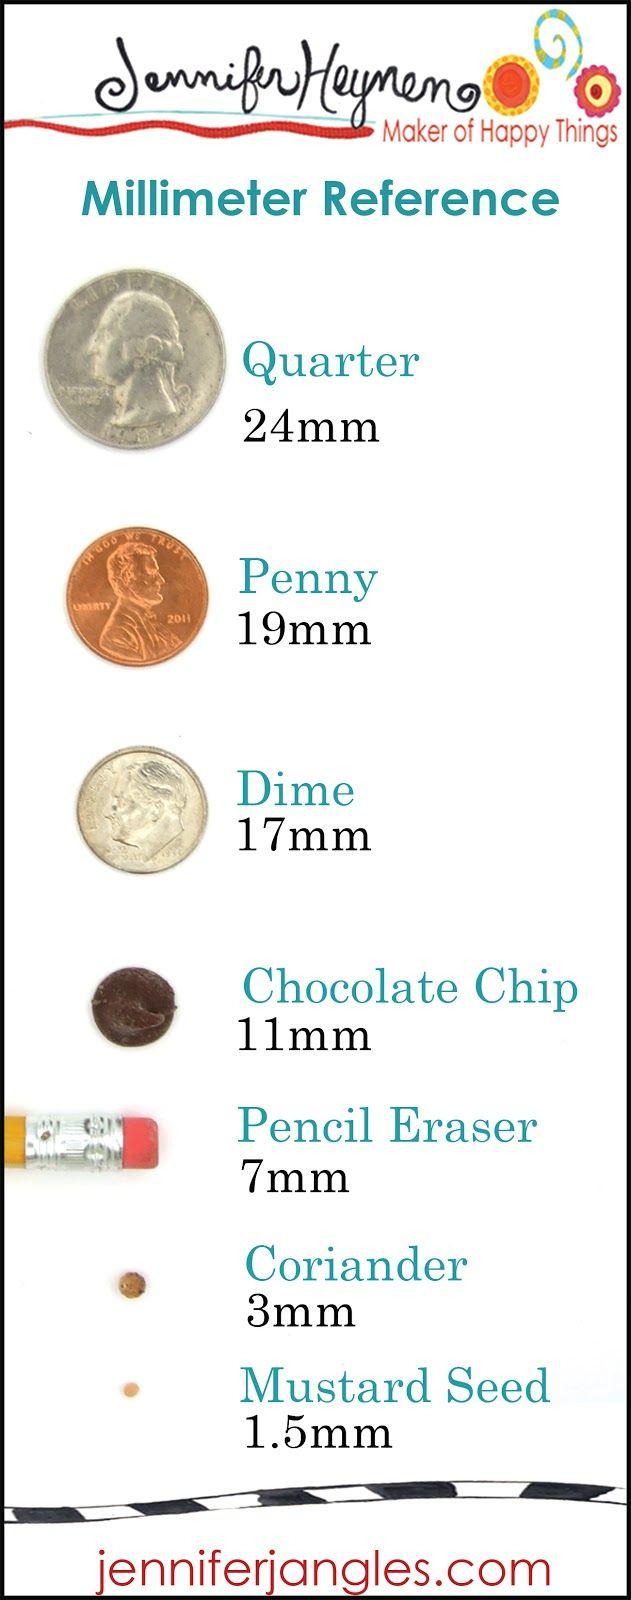 Millimeter reference guide for jewelry design - Jennifer Jangles Blog: Jewelry Making Basics